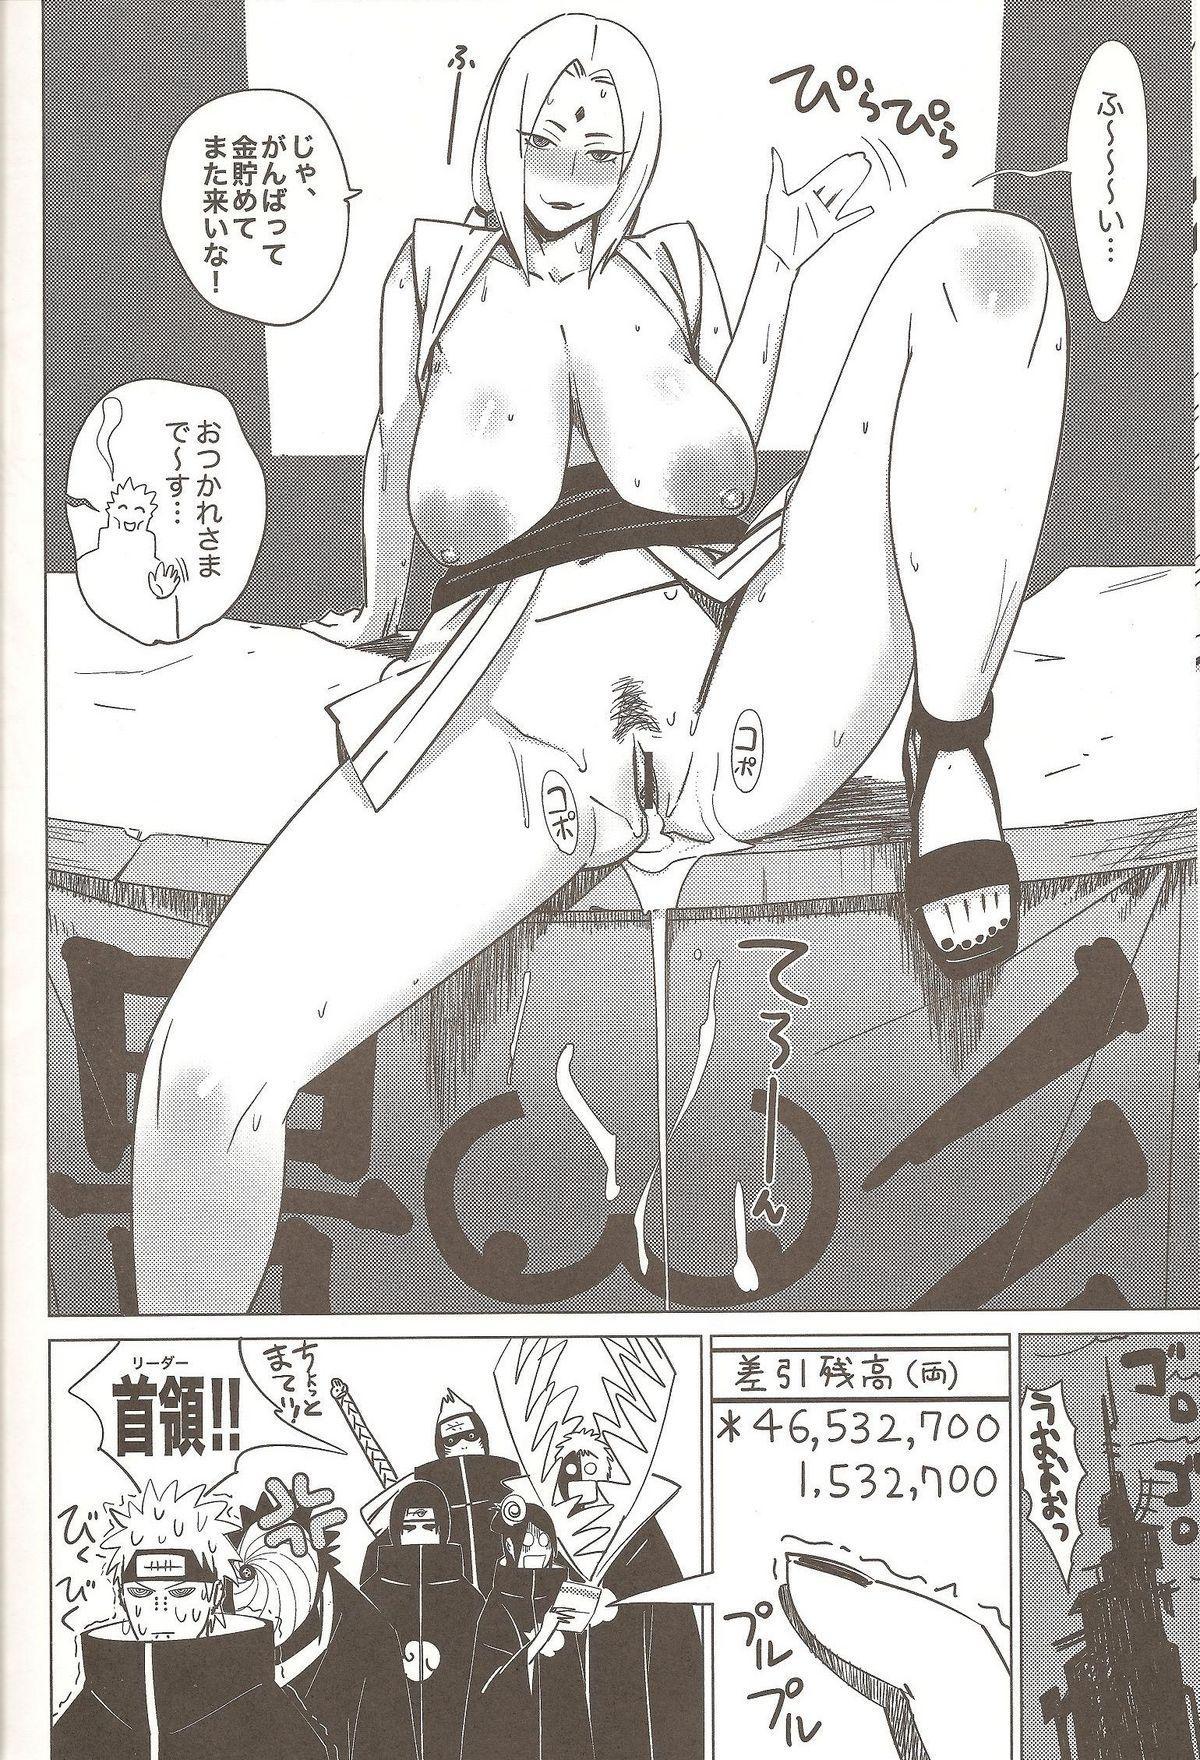 AbRAdEli kAMiTAbA No. 01 Chichikage Hanjouki 16